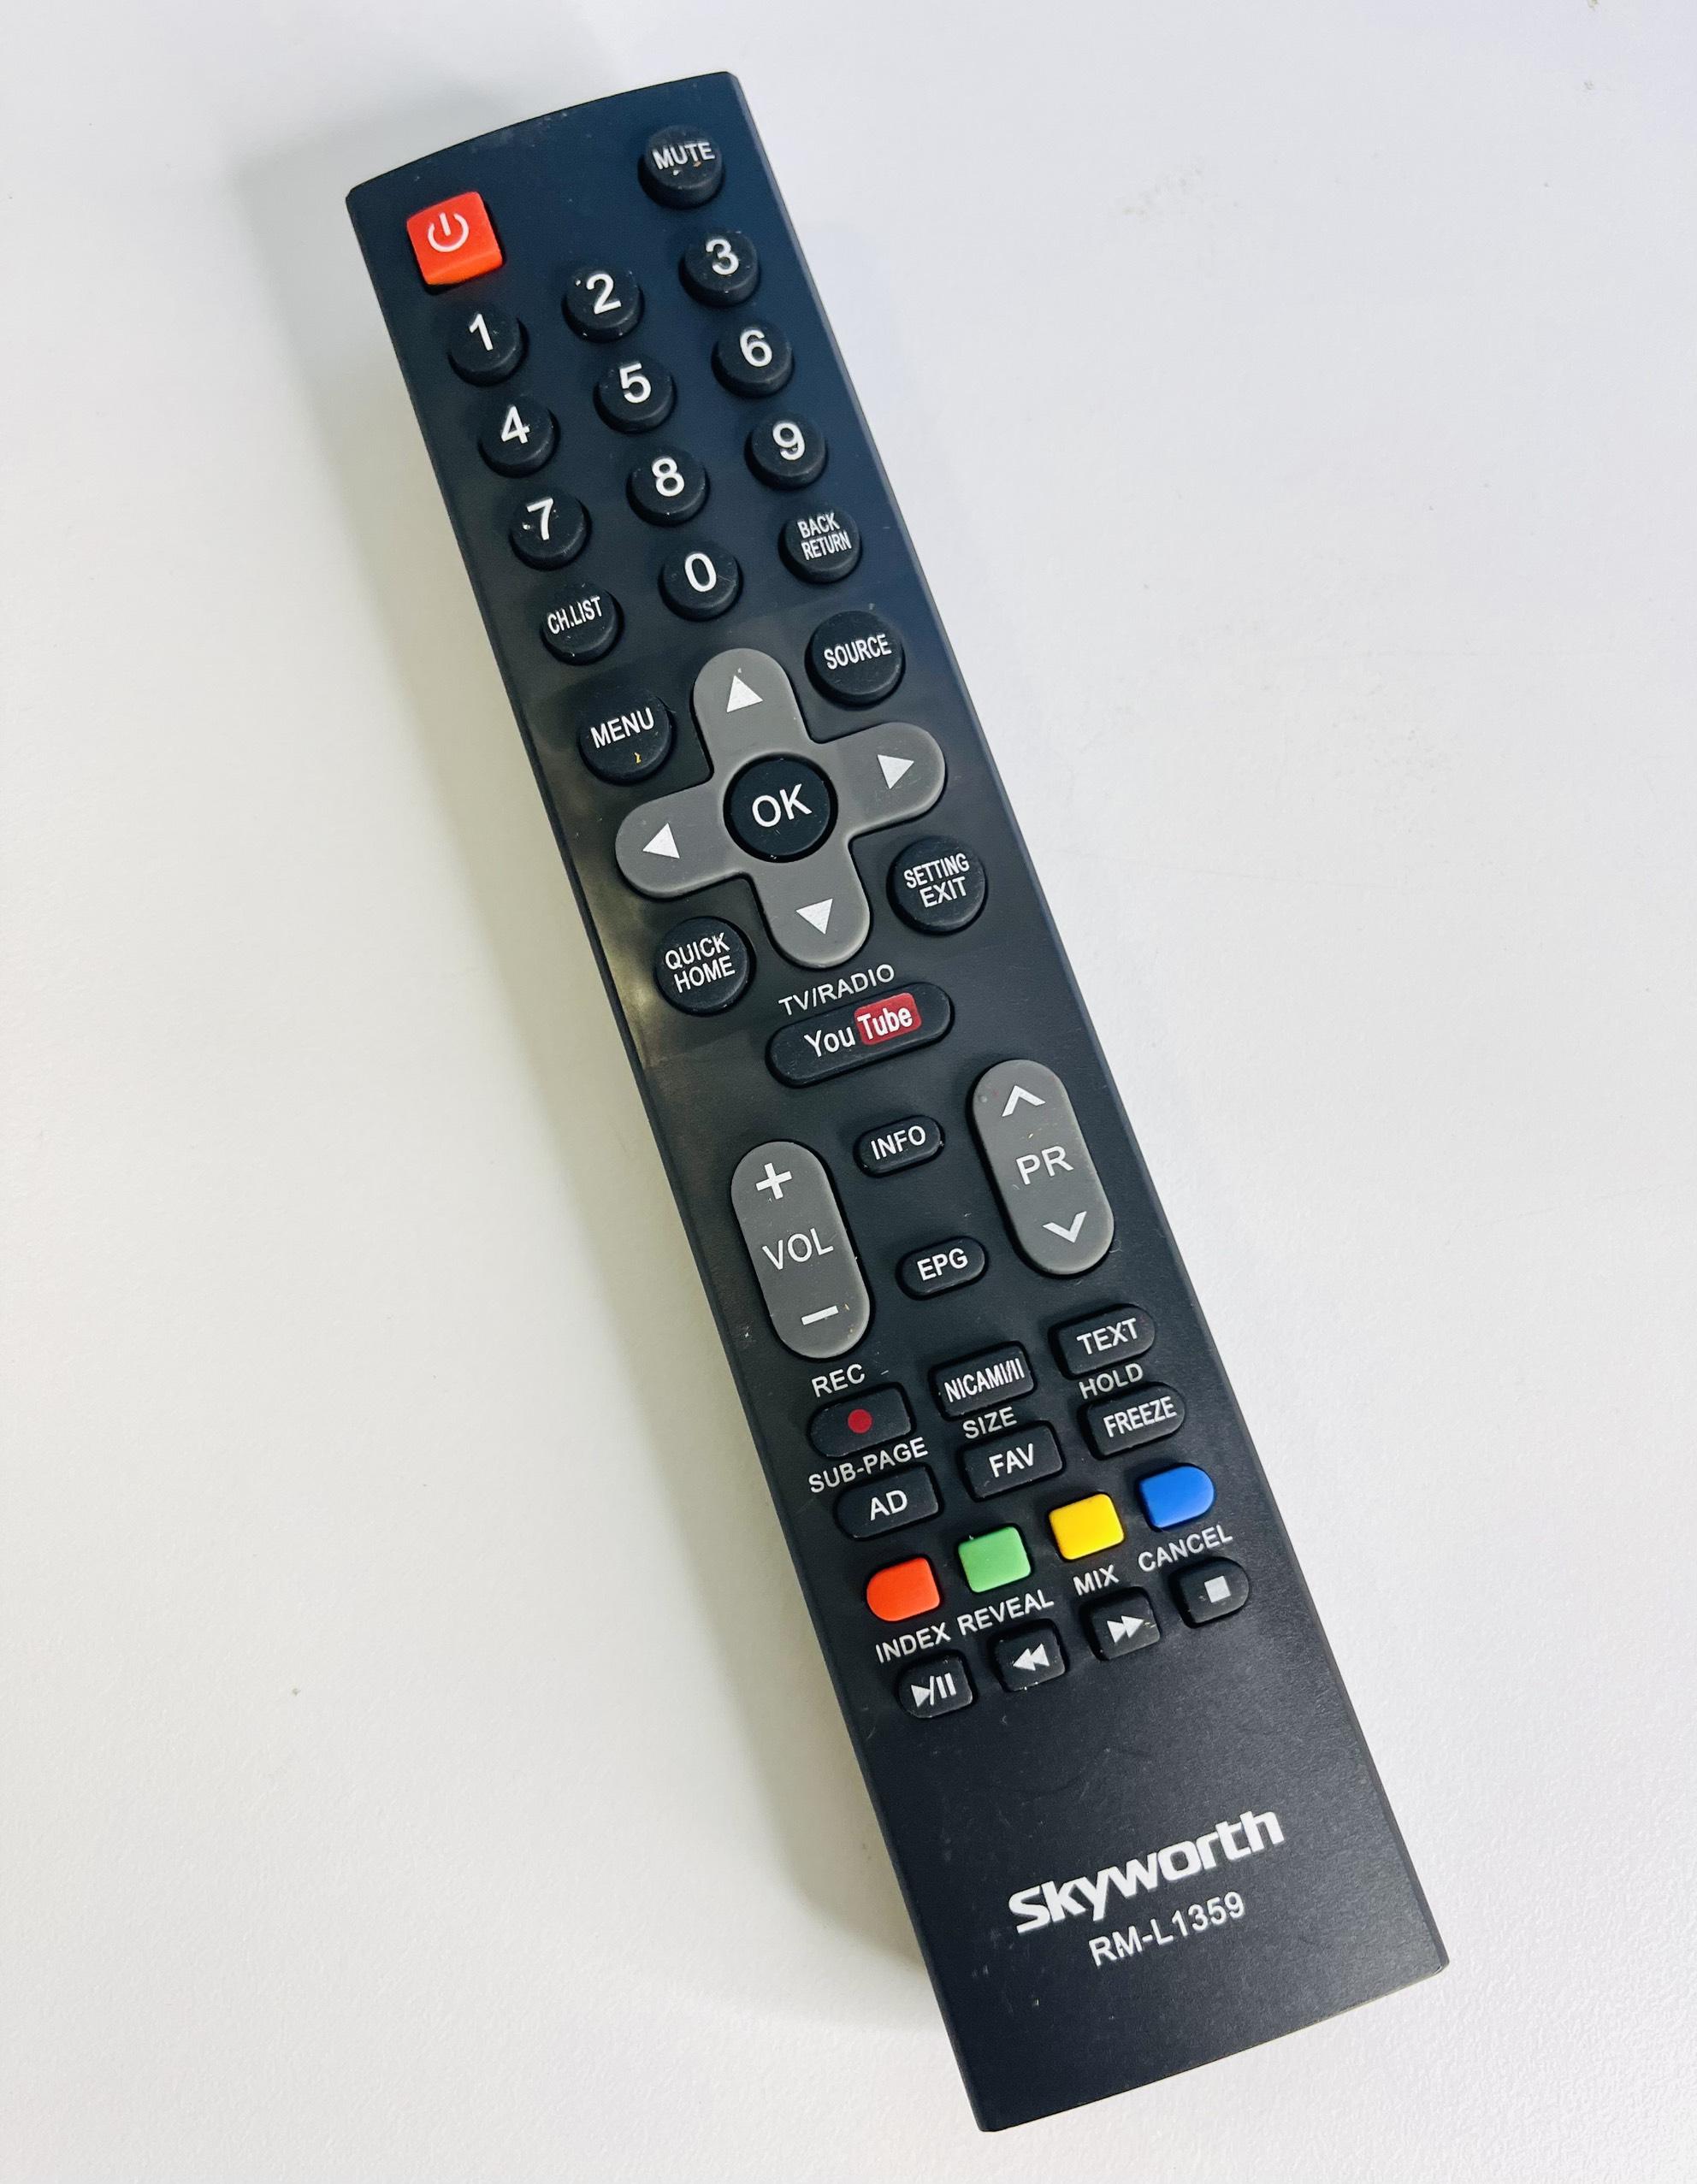 điều khiển tivi skyworth L1359 (SP 1122)